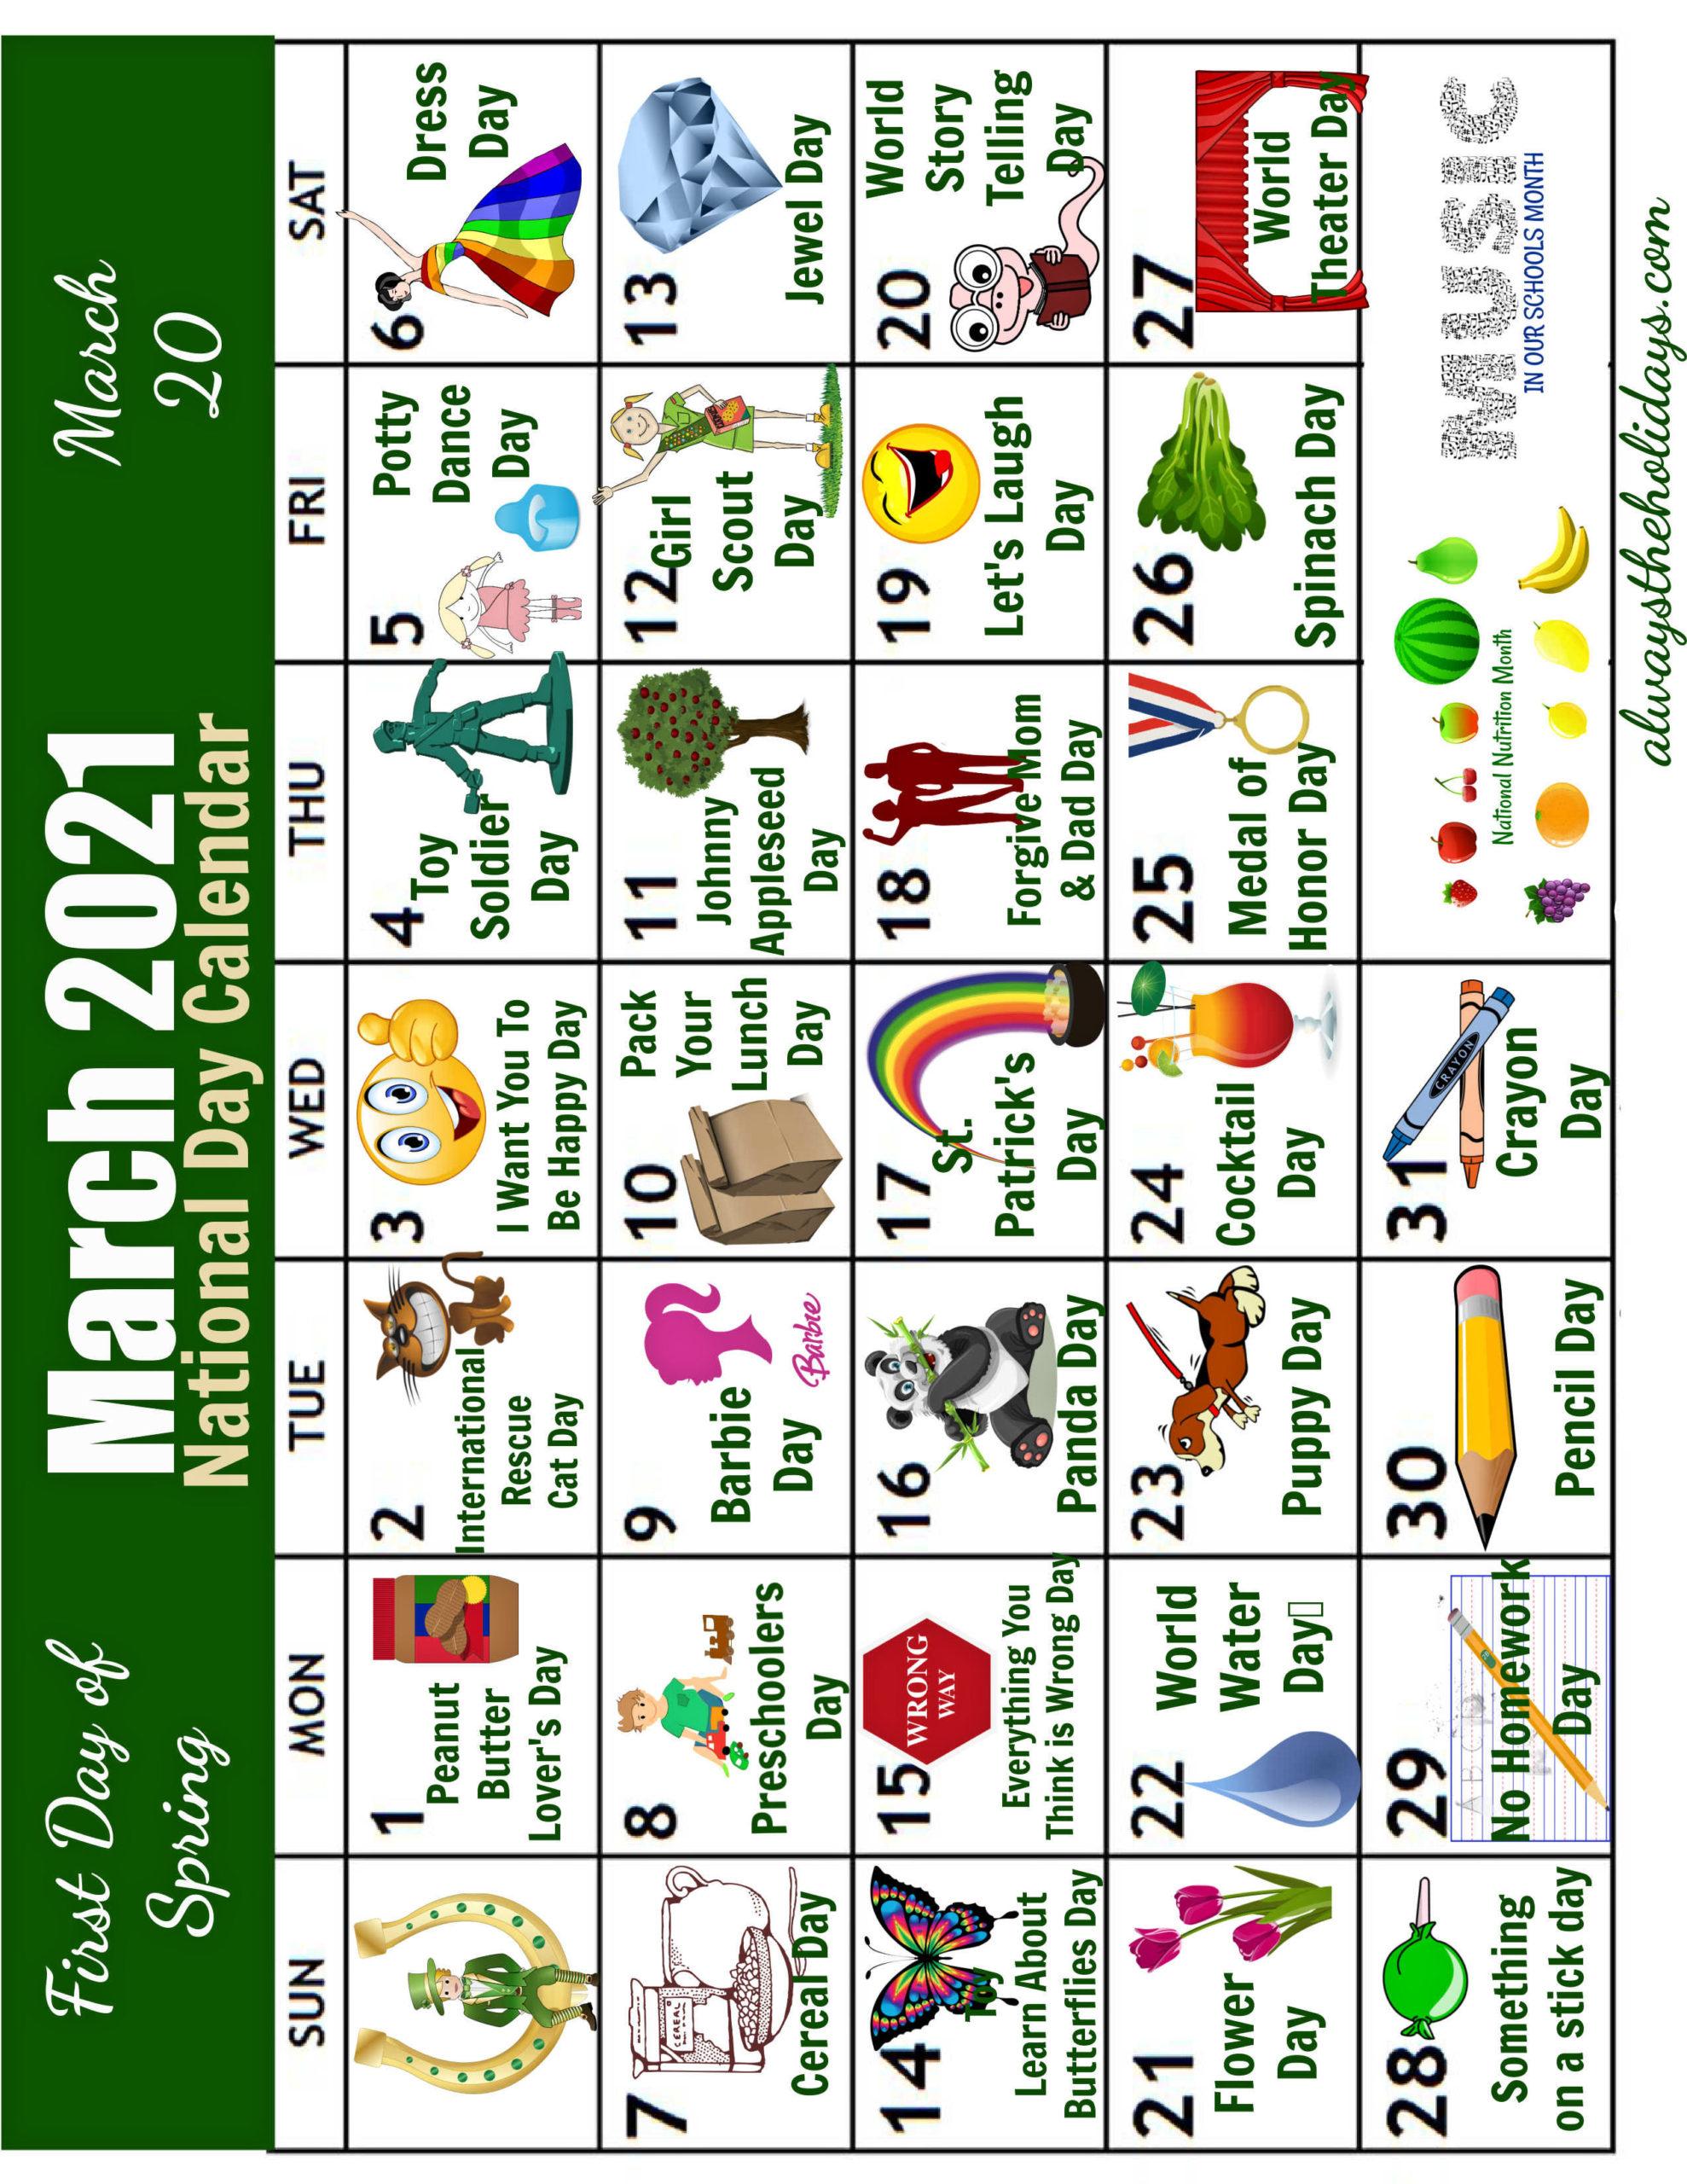 March National Days calendar flipped